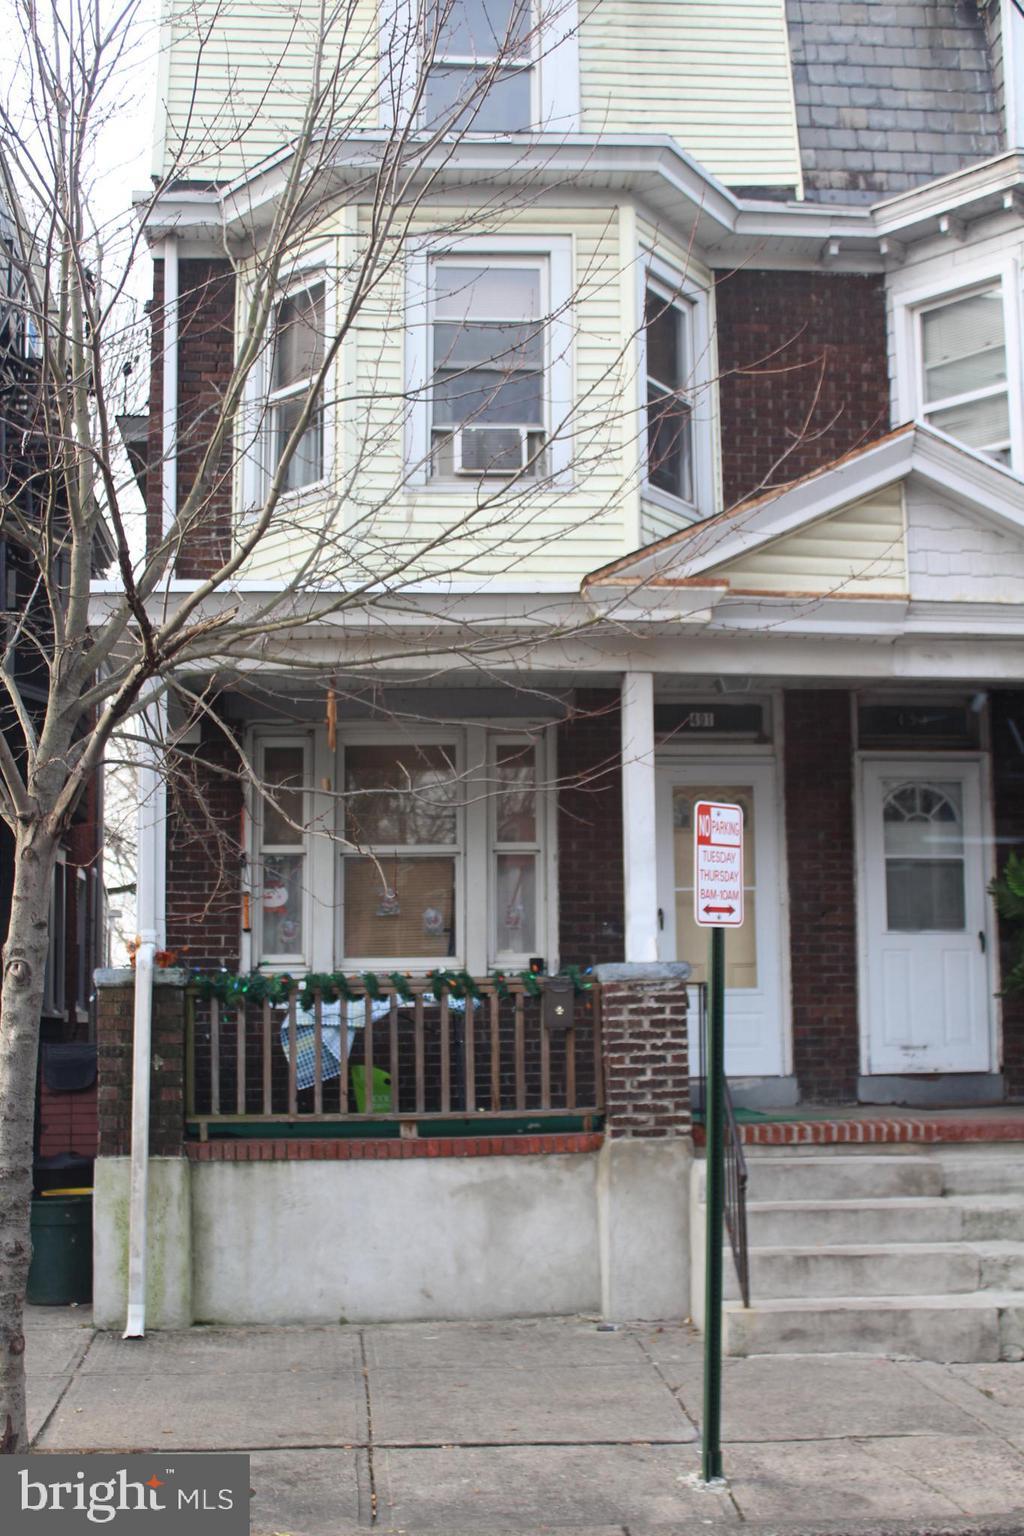 491 W HANOVER ST, TRENTON, NJ 08608